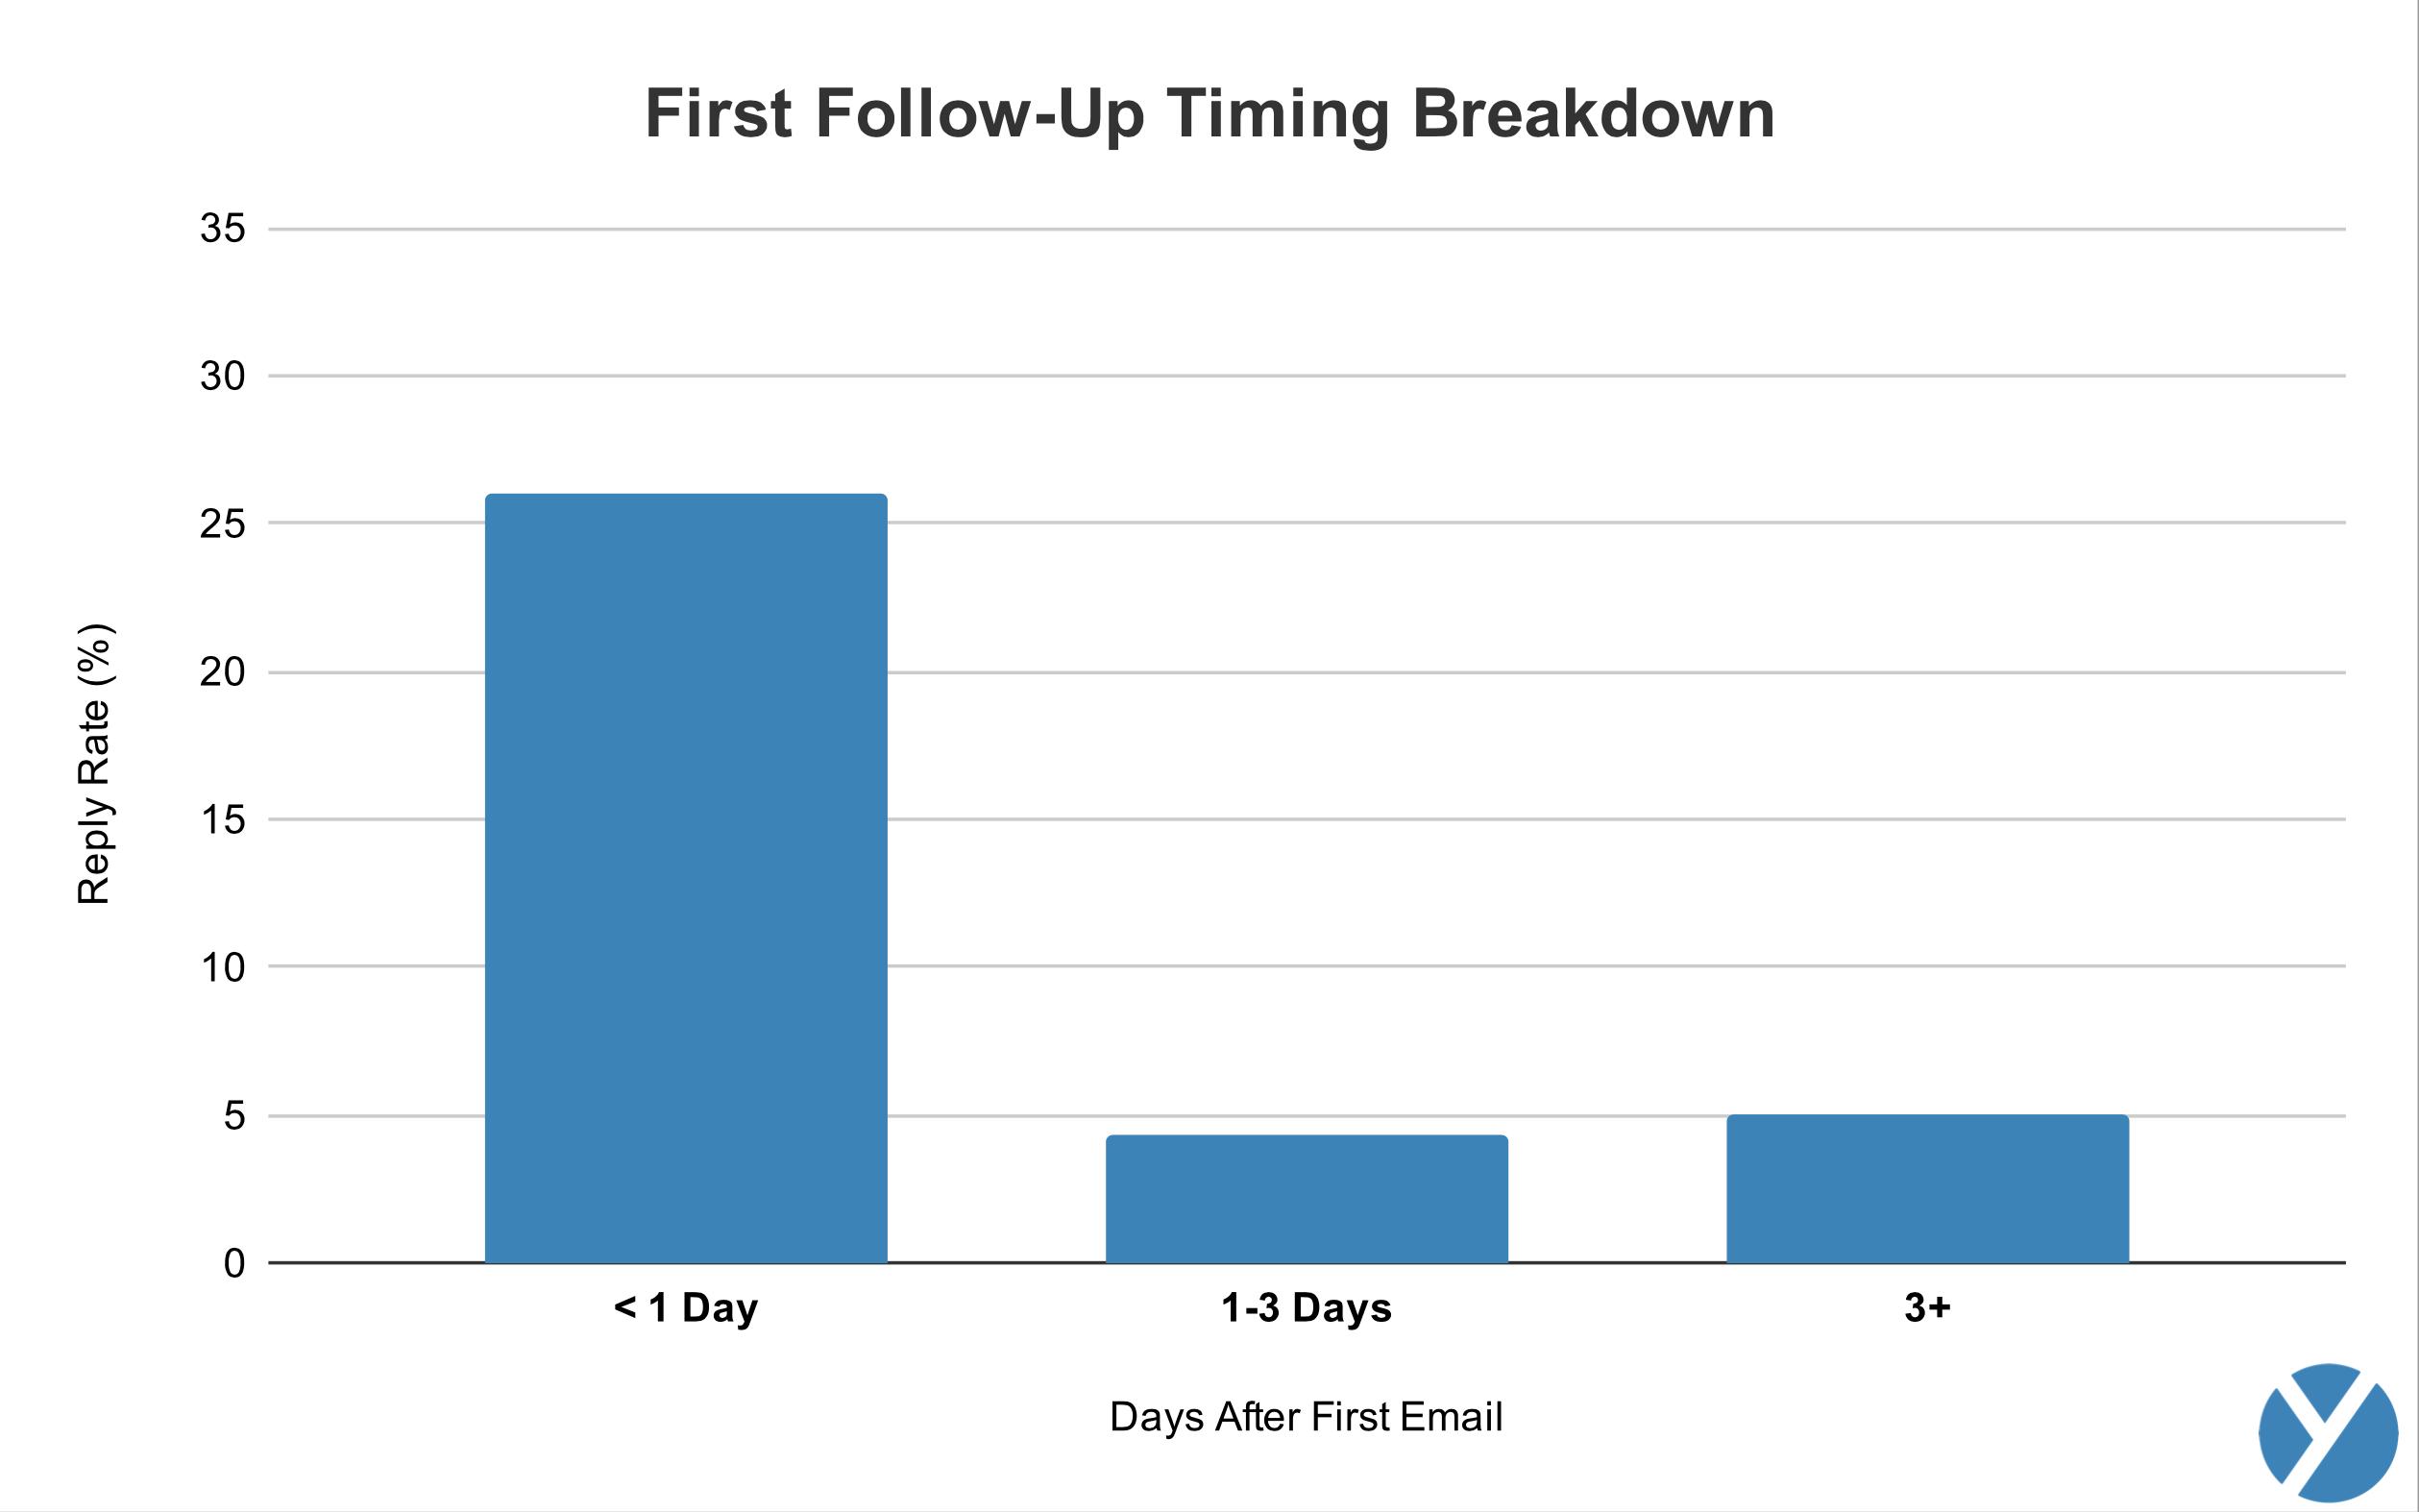 sales follow-up statistics: first follow-up timing breakdown